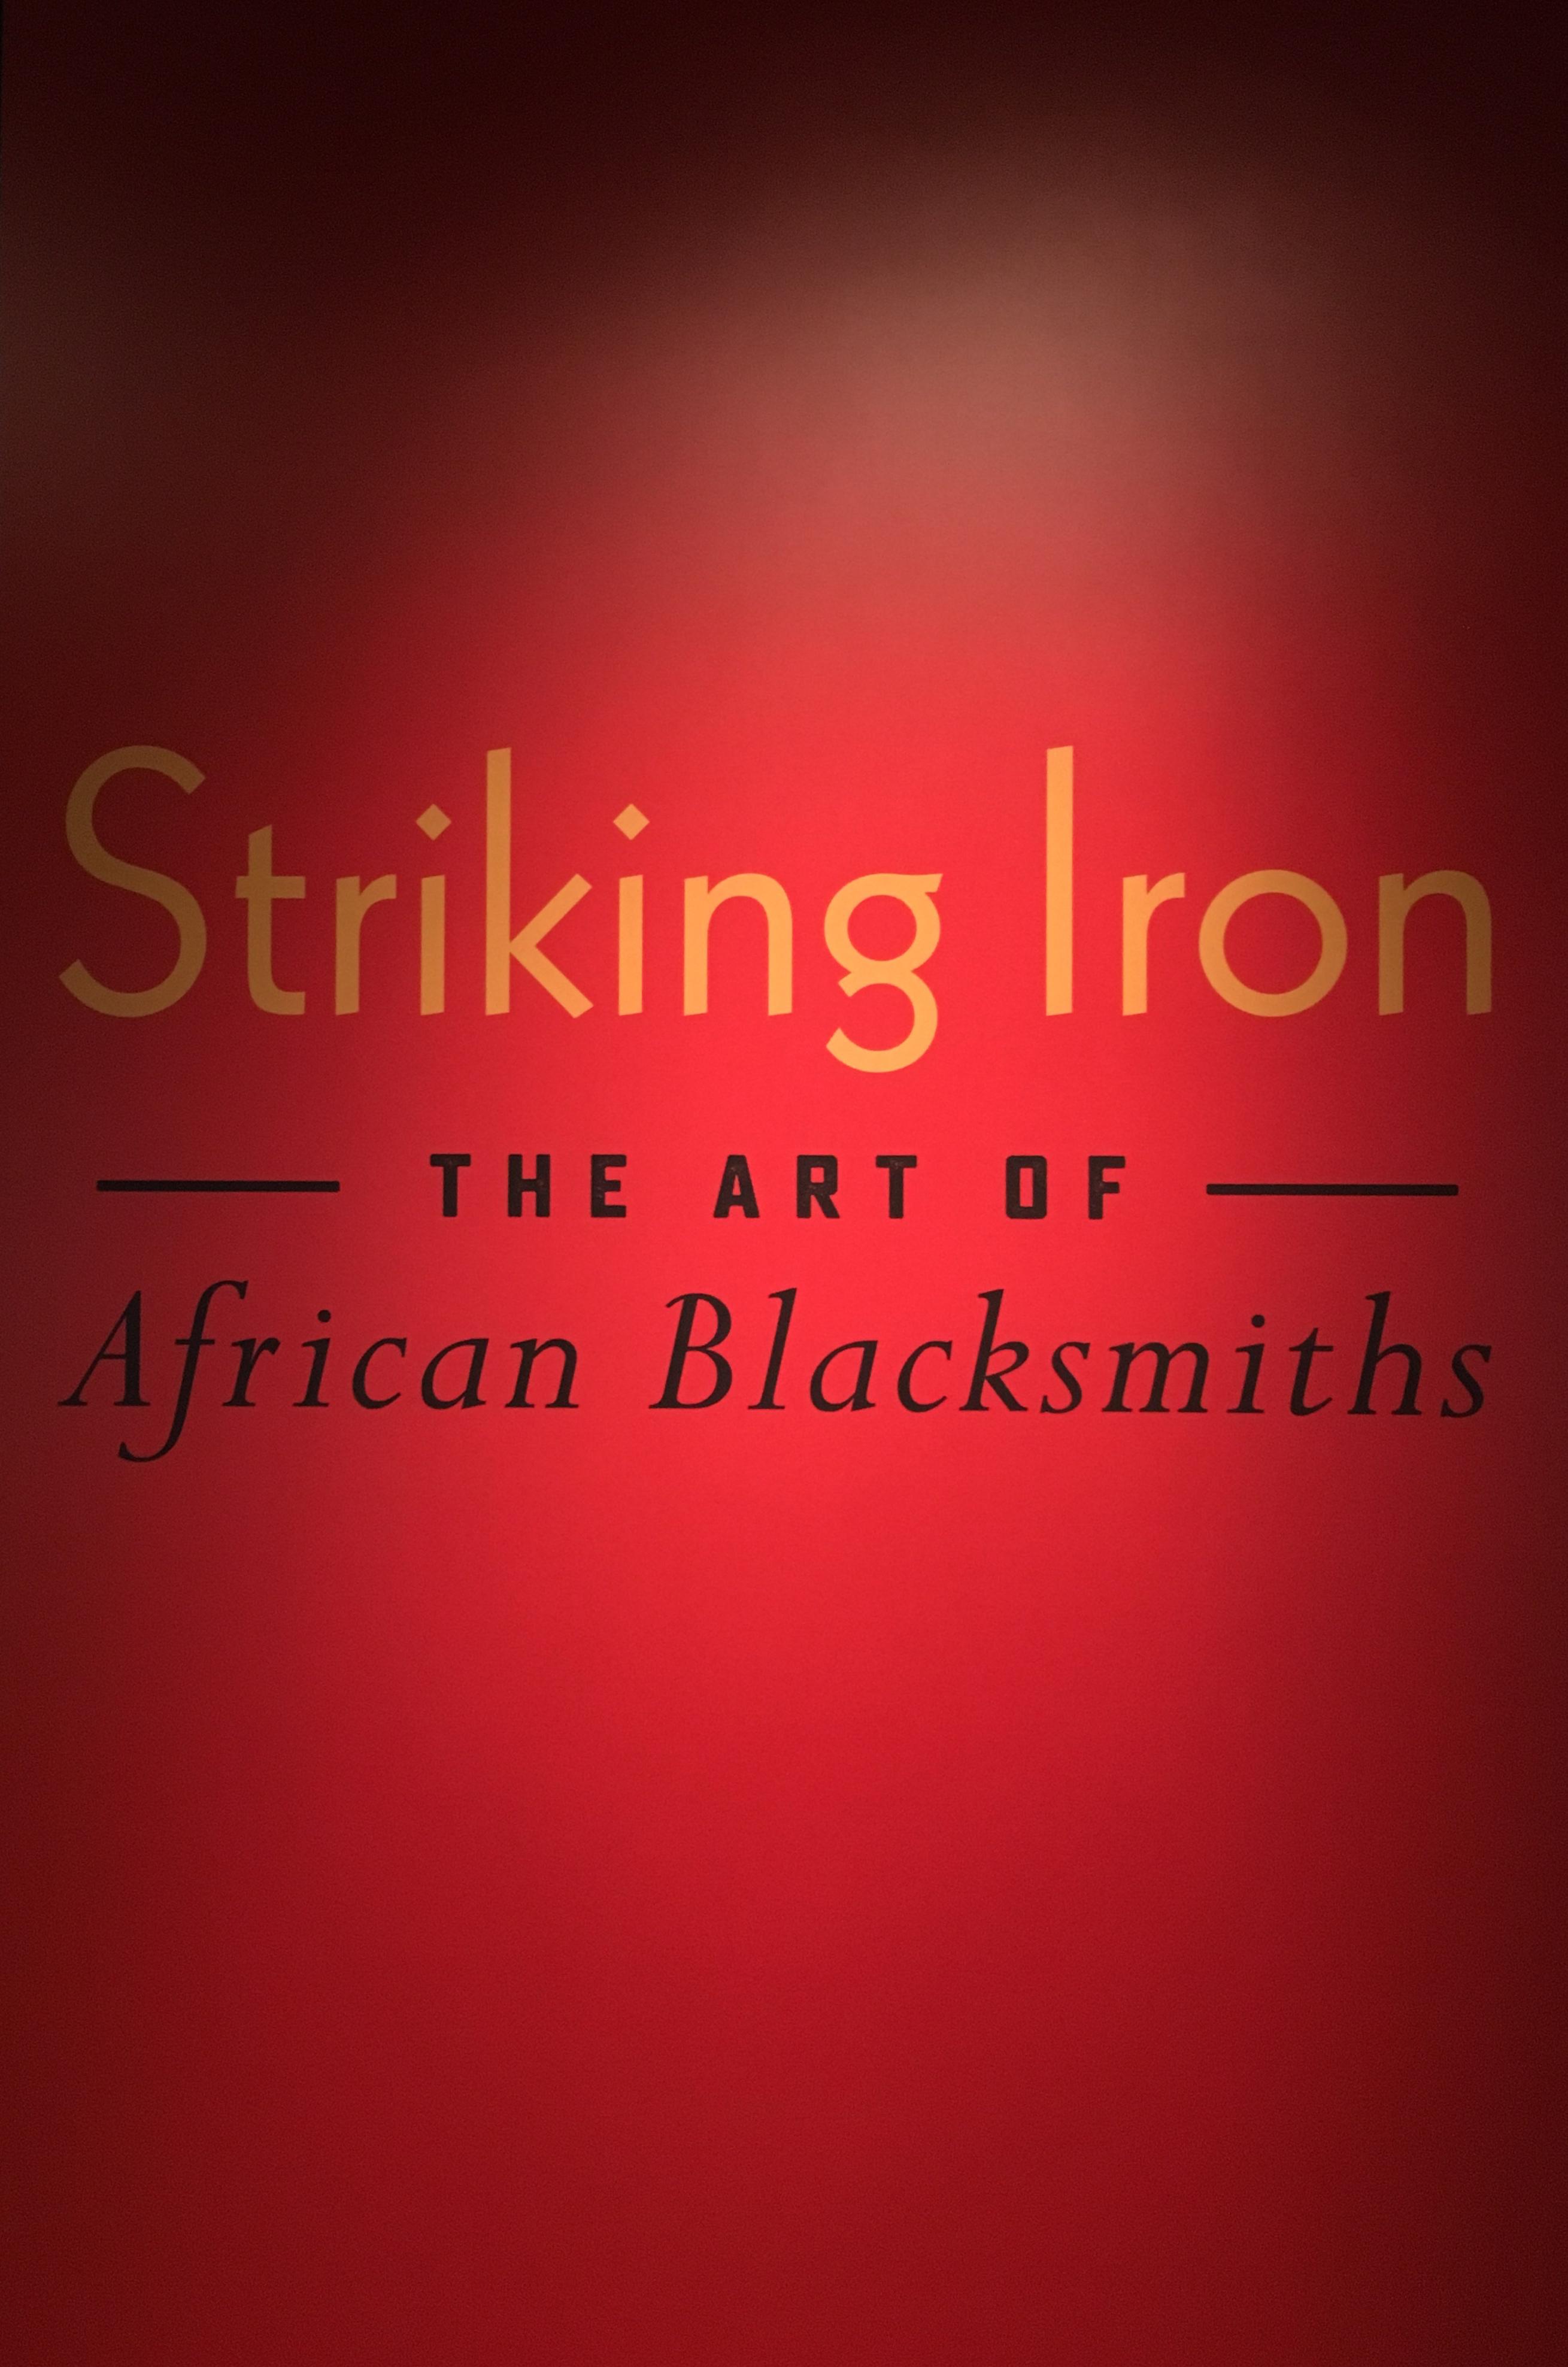 Striking Iron - The Art of African Blacksmiths